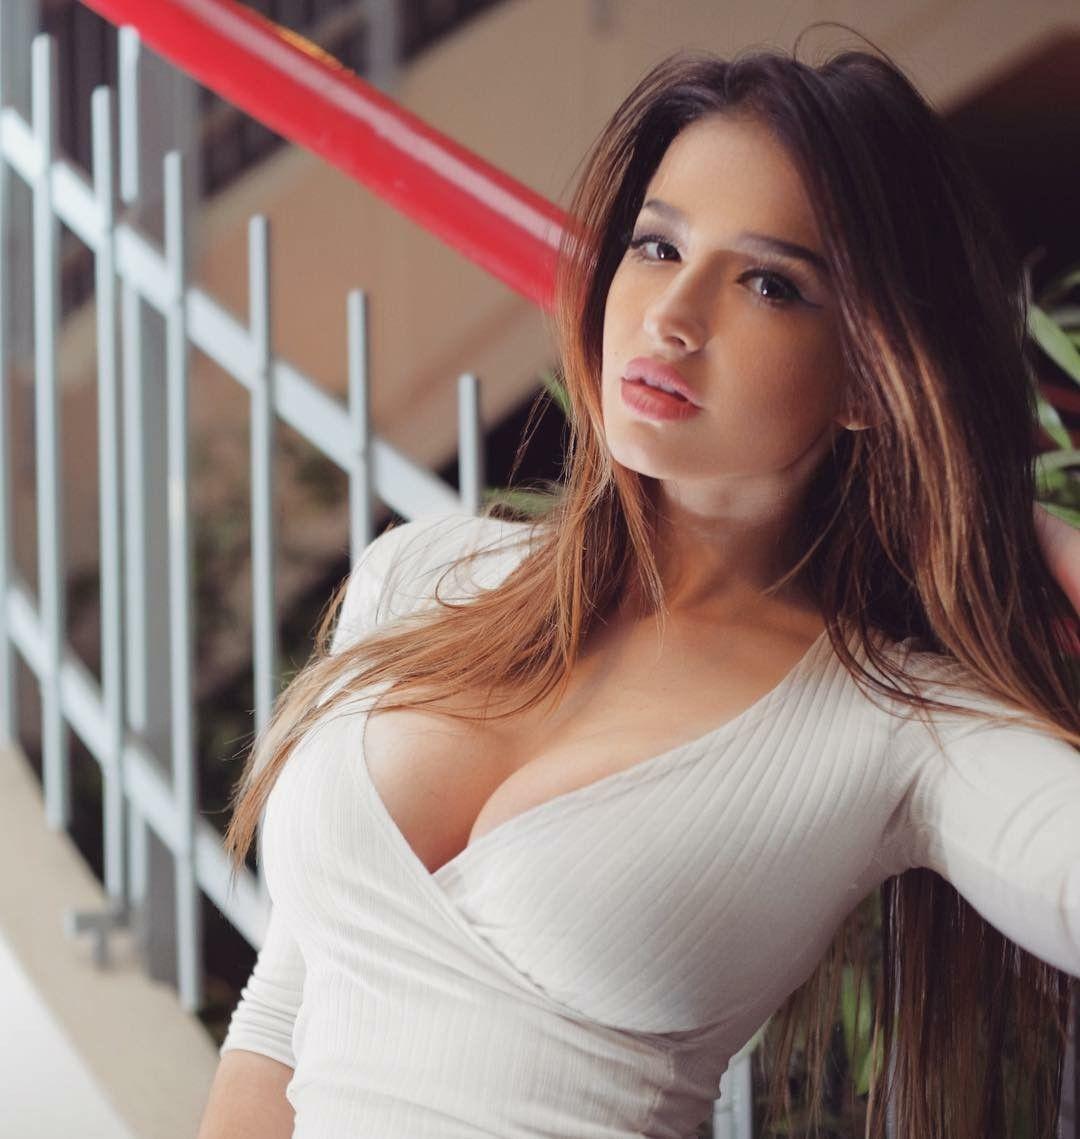 Audrey bitoni and free porn bbw